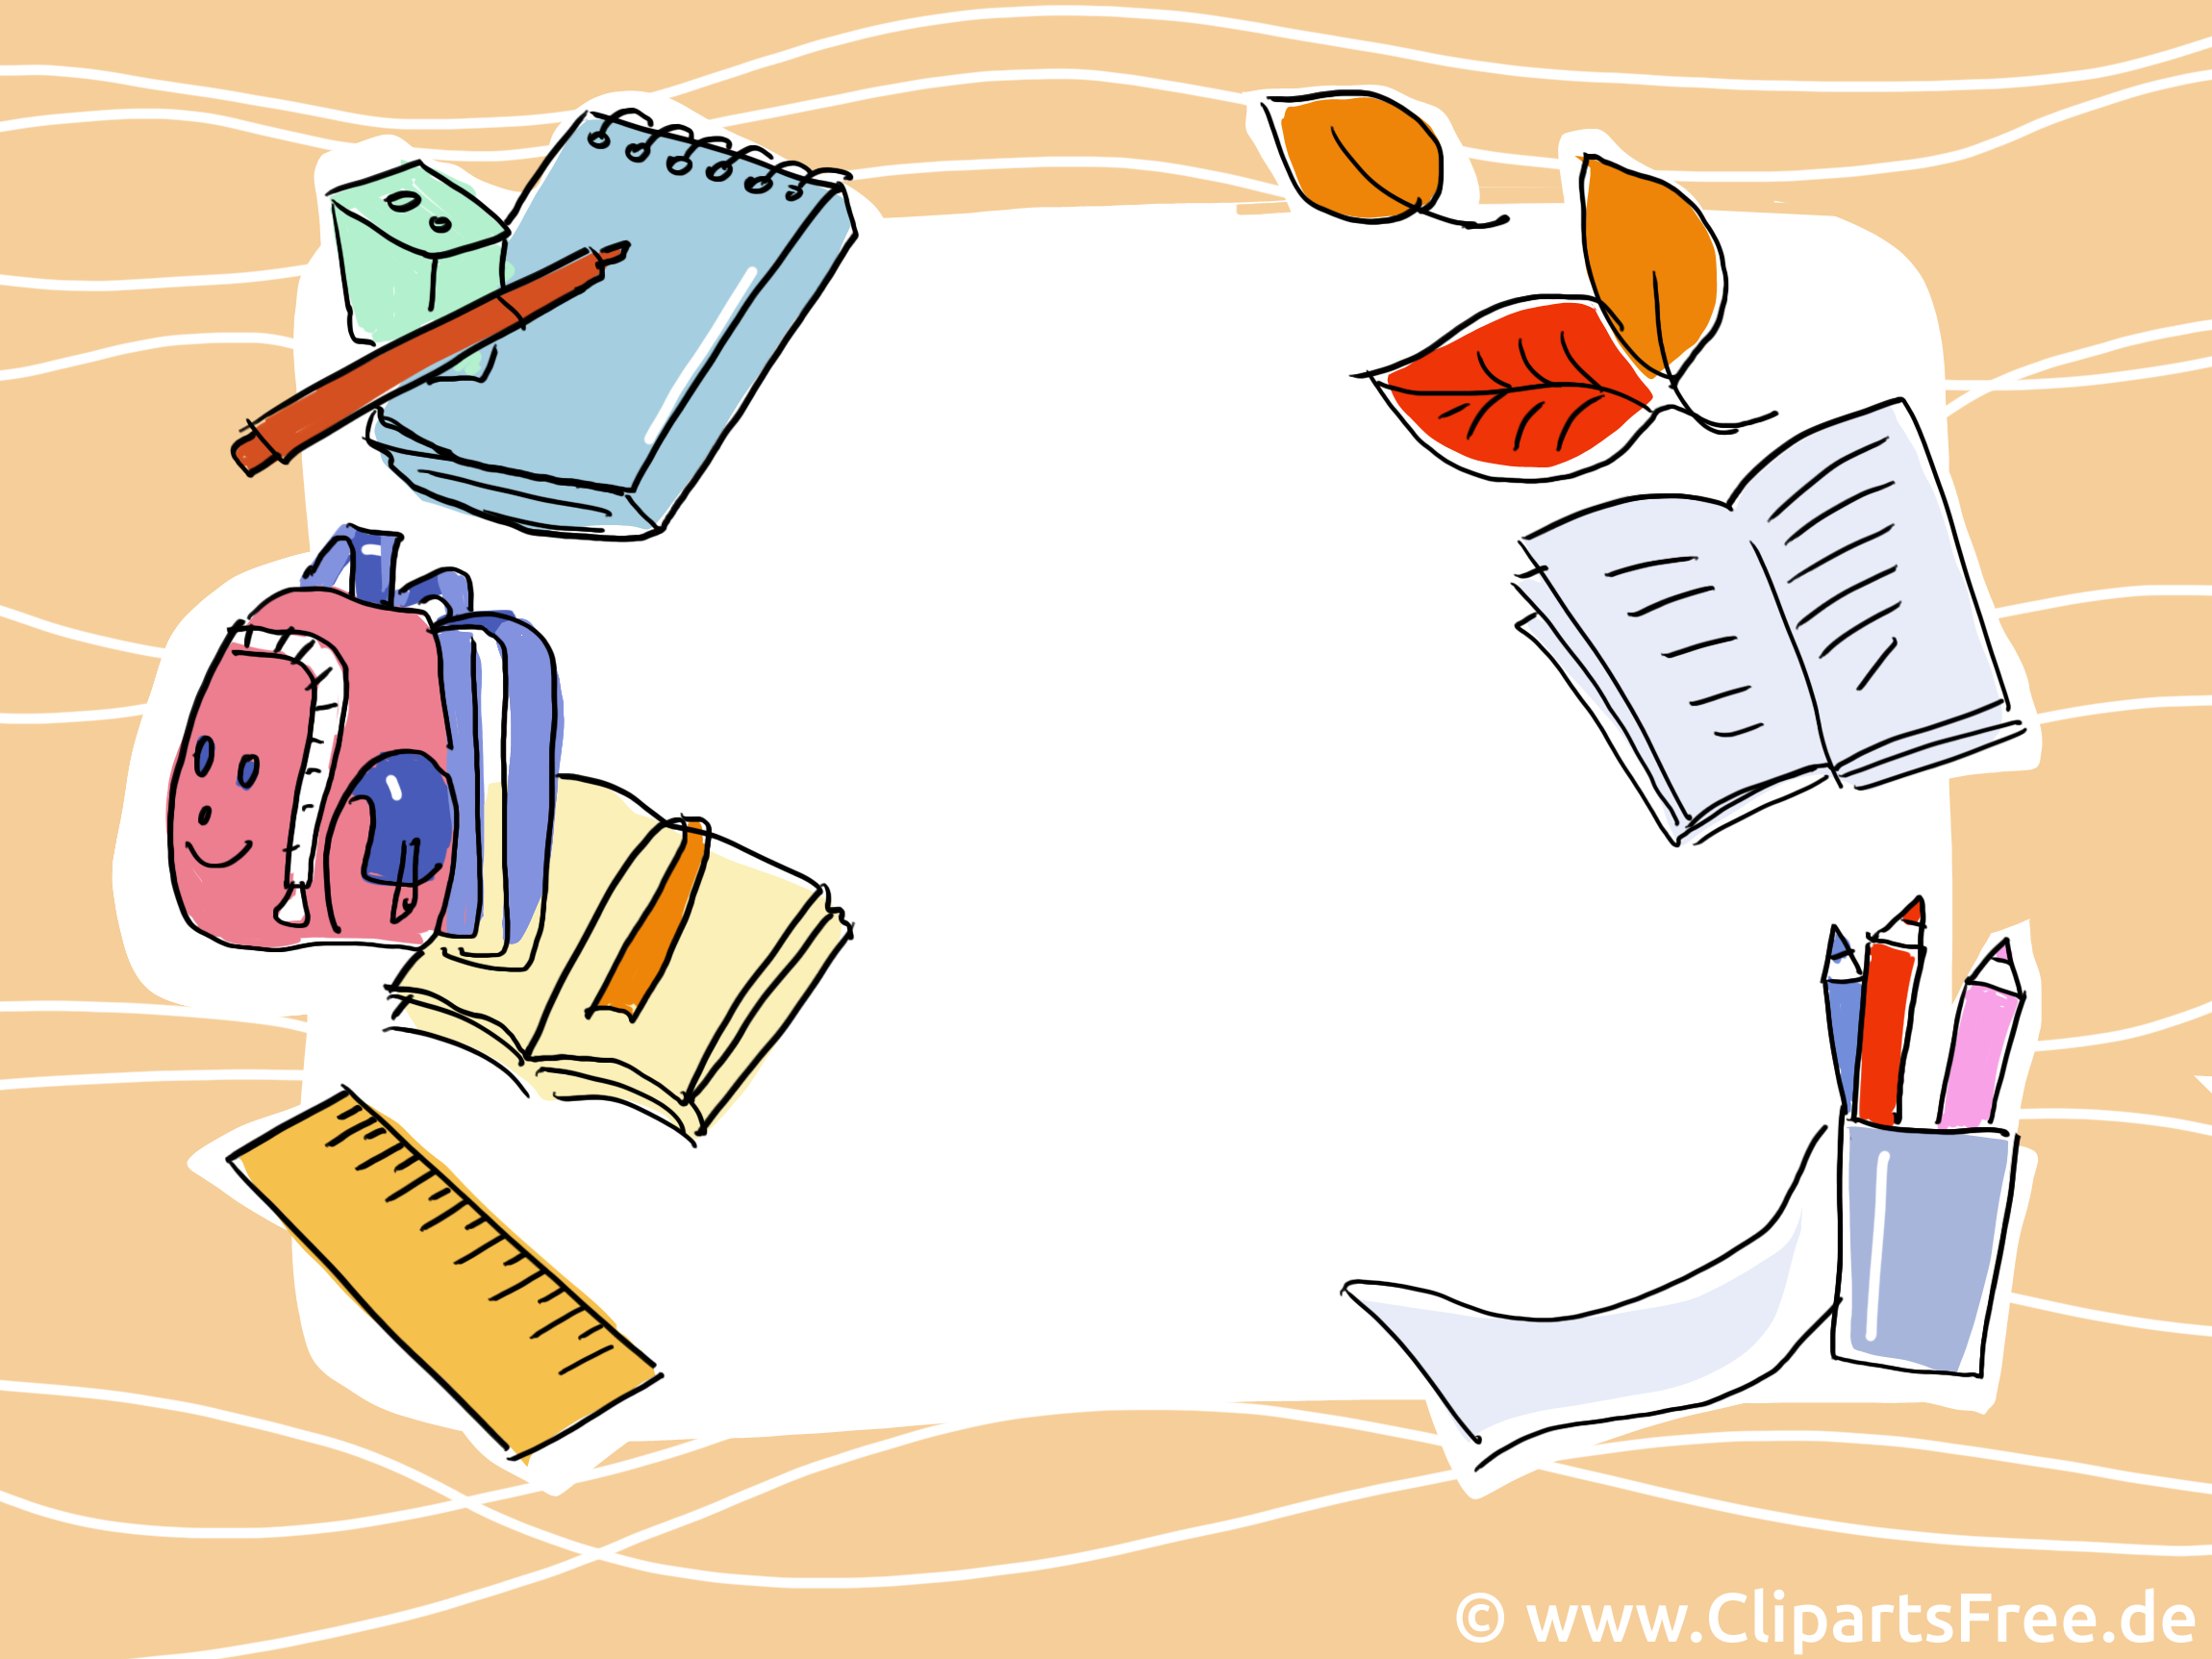 Schulanfang clipart kostenlos vector royalty free Hintergrundbild Schule. Schulanfang, Einschulung gratis vector royalty free